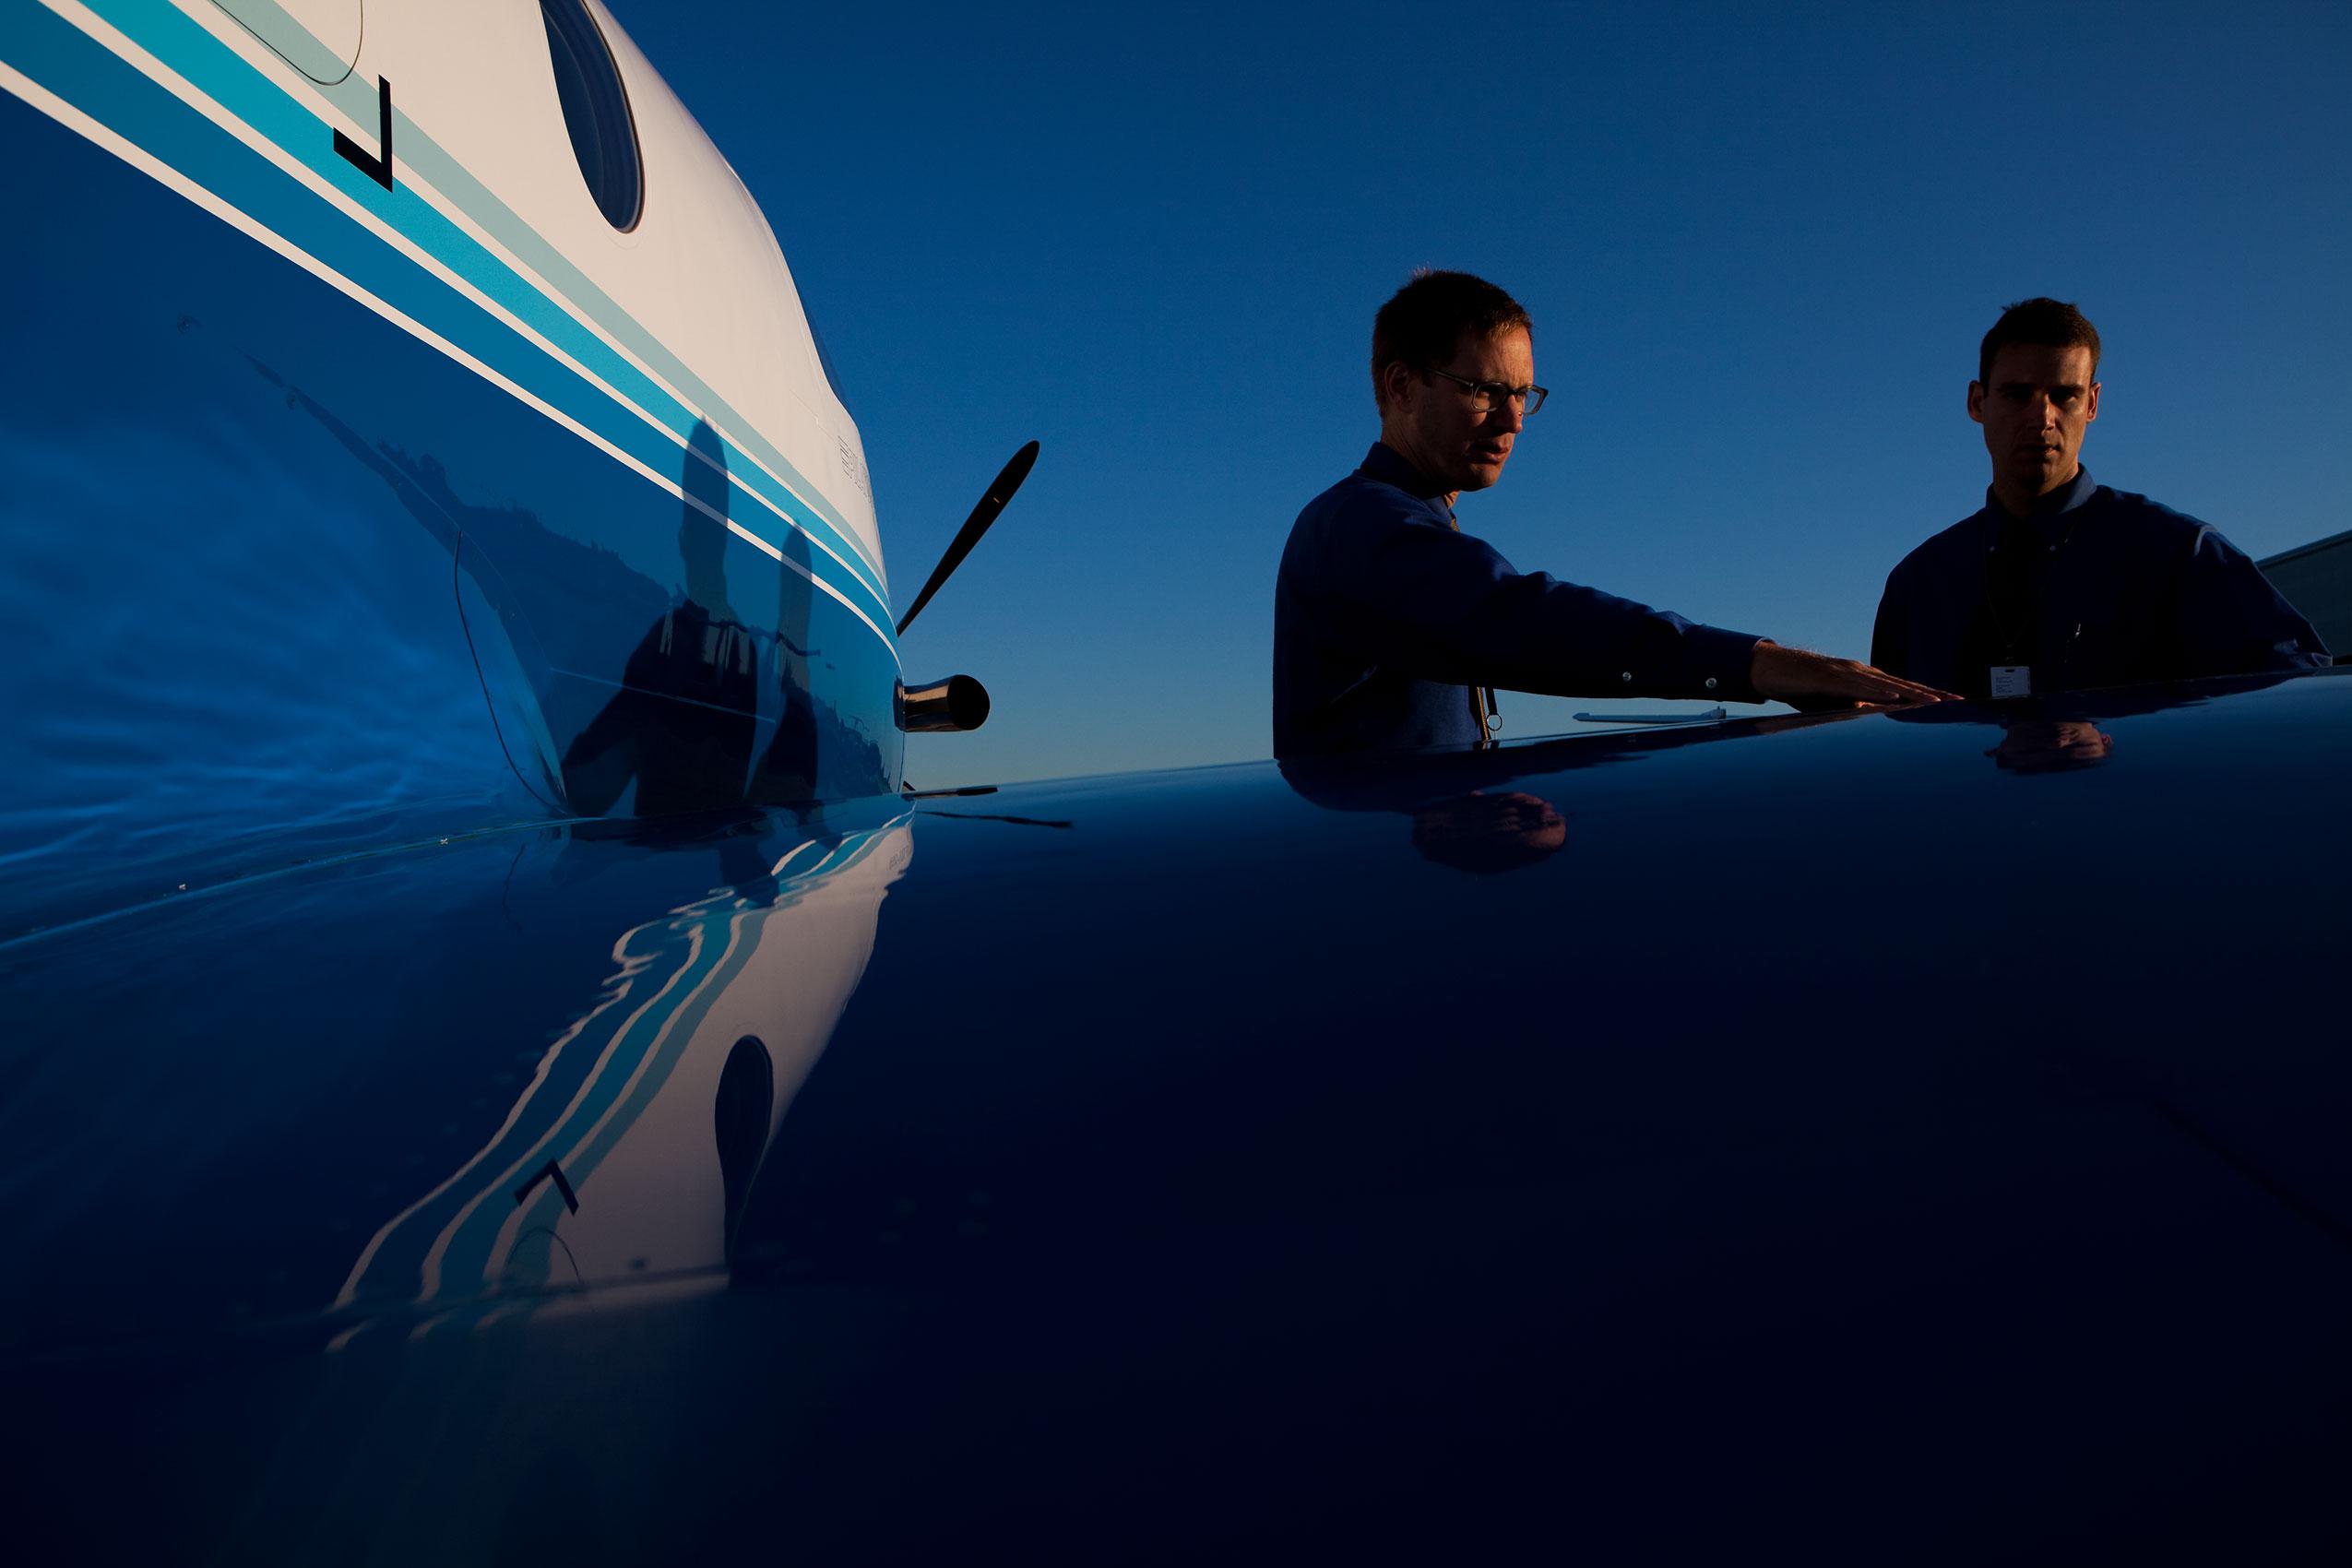 Pilot Salary & Benefits, Schedules & Training | PlaneSense